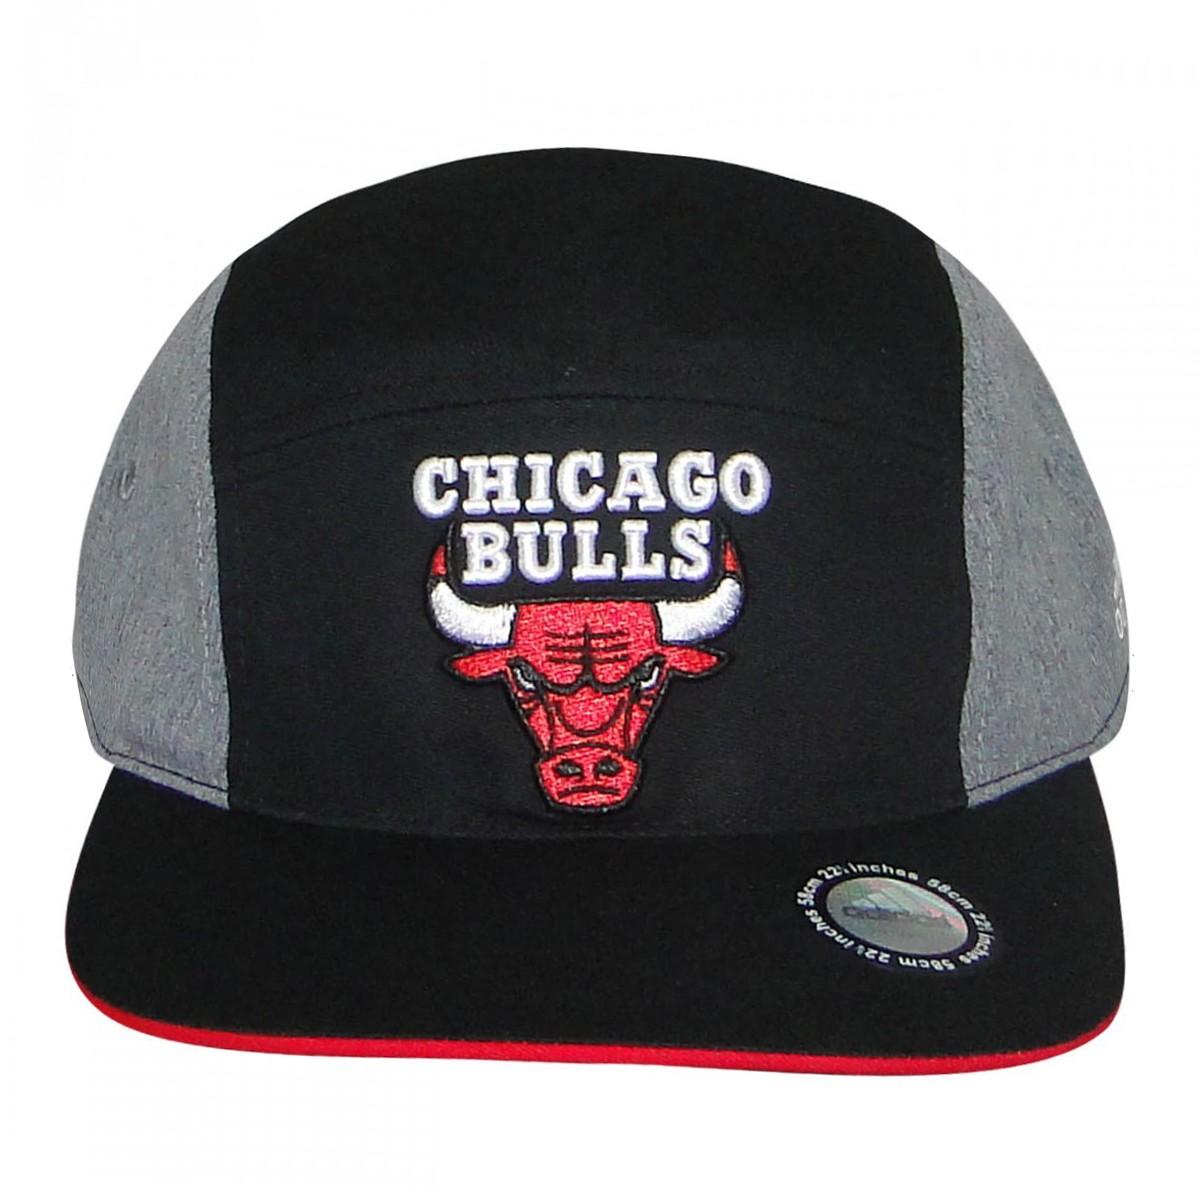 6255c856d1bdb Bone Adidas Chicago Bulls F78125 - Preto Cinza Vermelho - Chuteira Nike